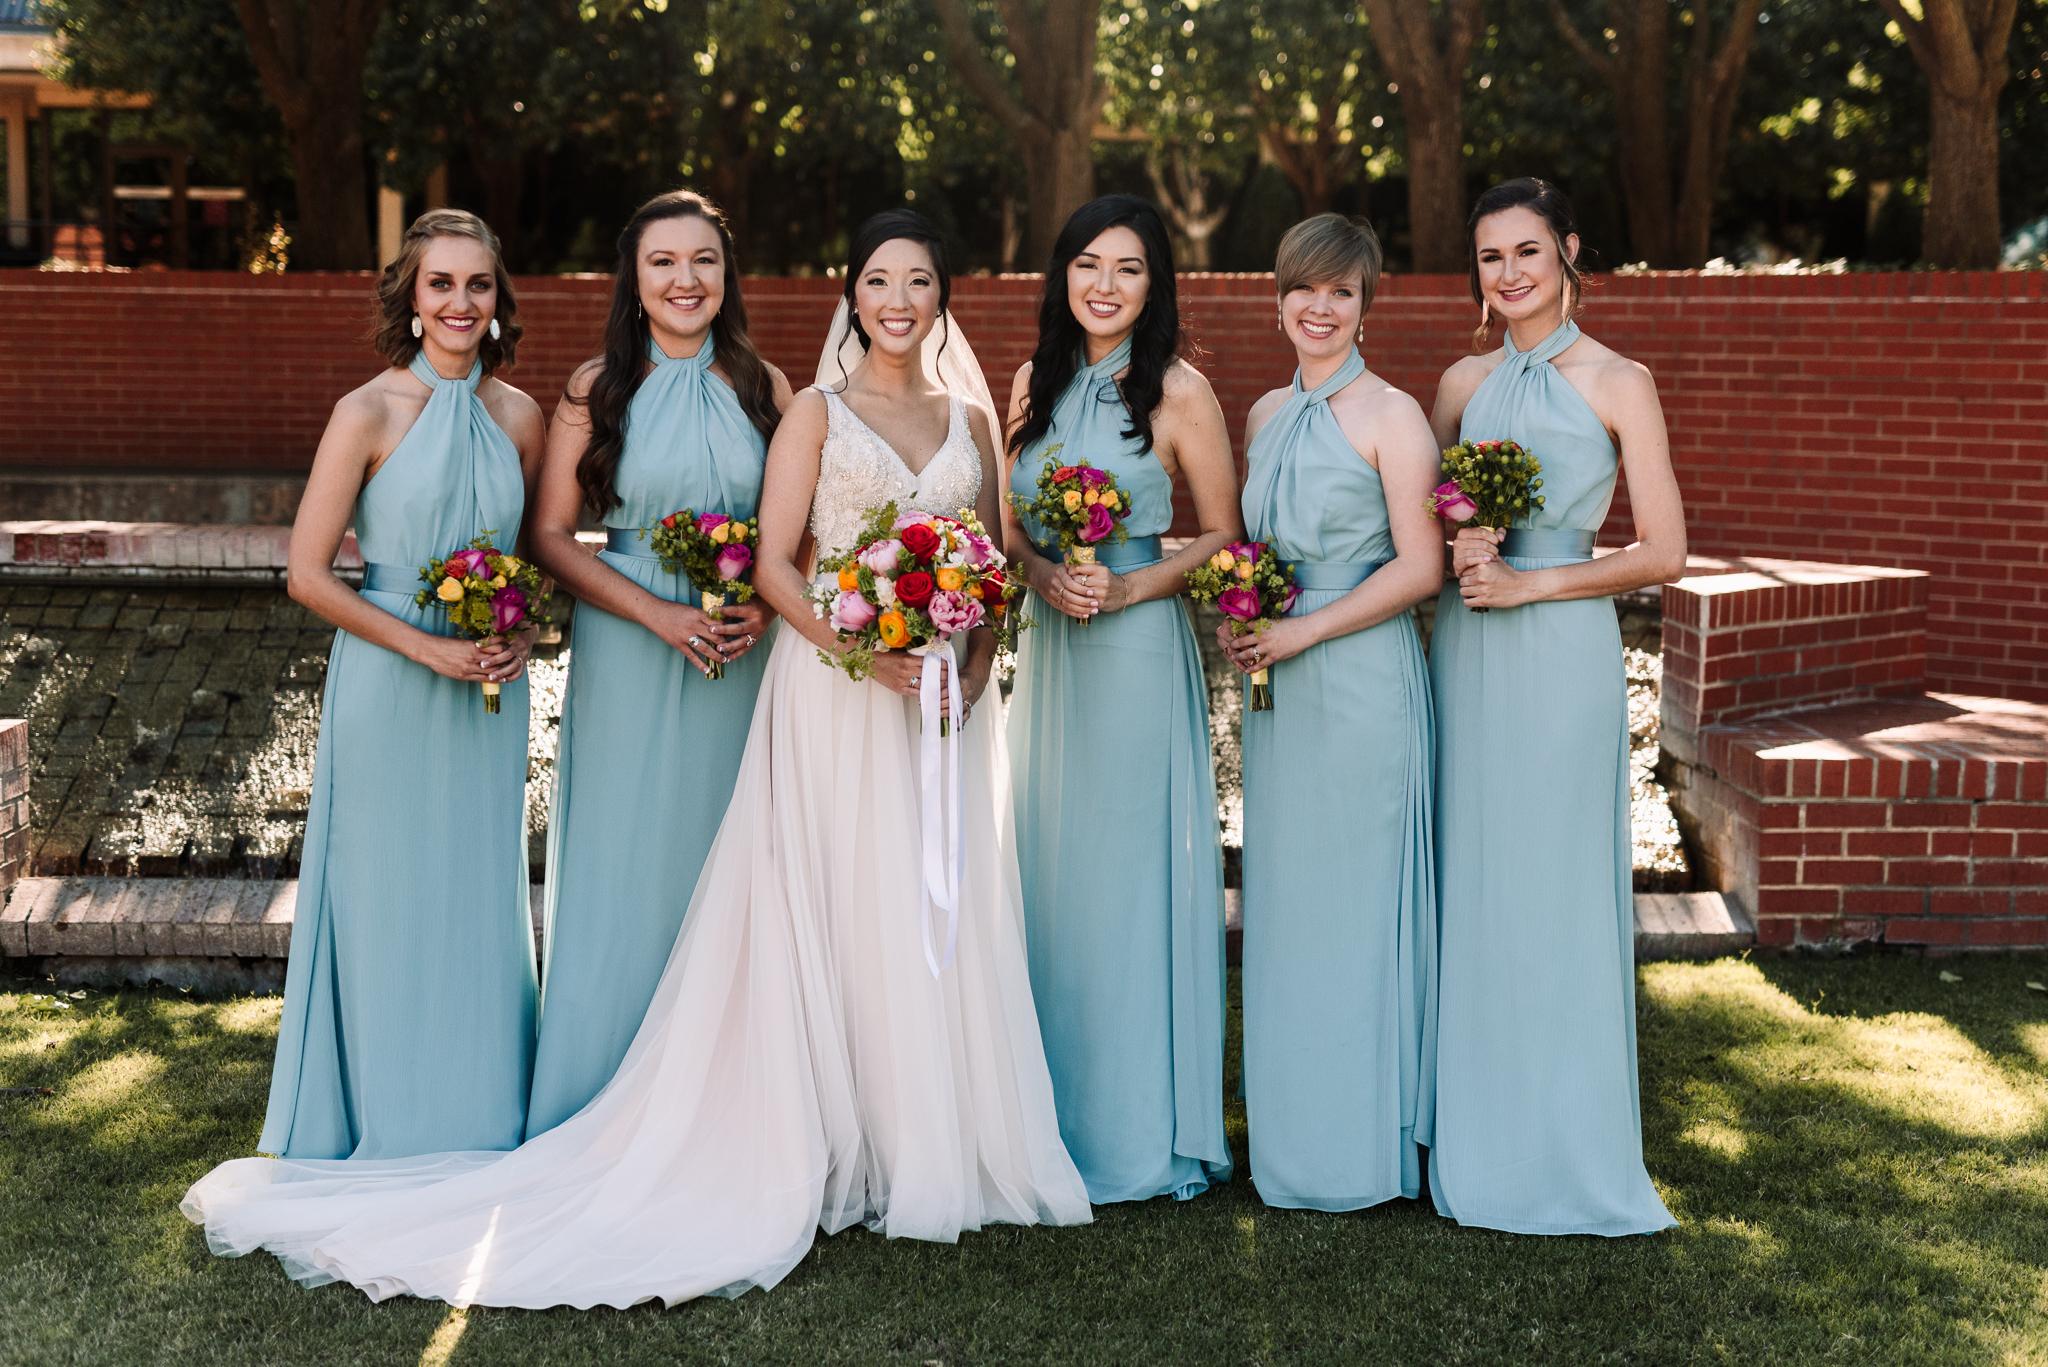 Oklahoma-Christian-University-Wedding-7719.jpg